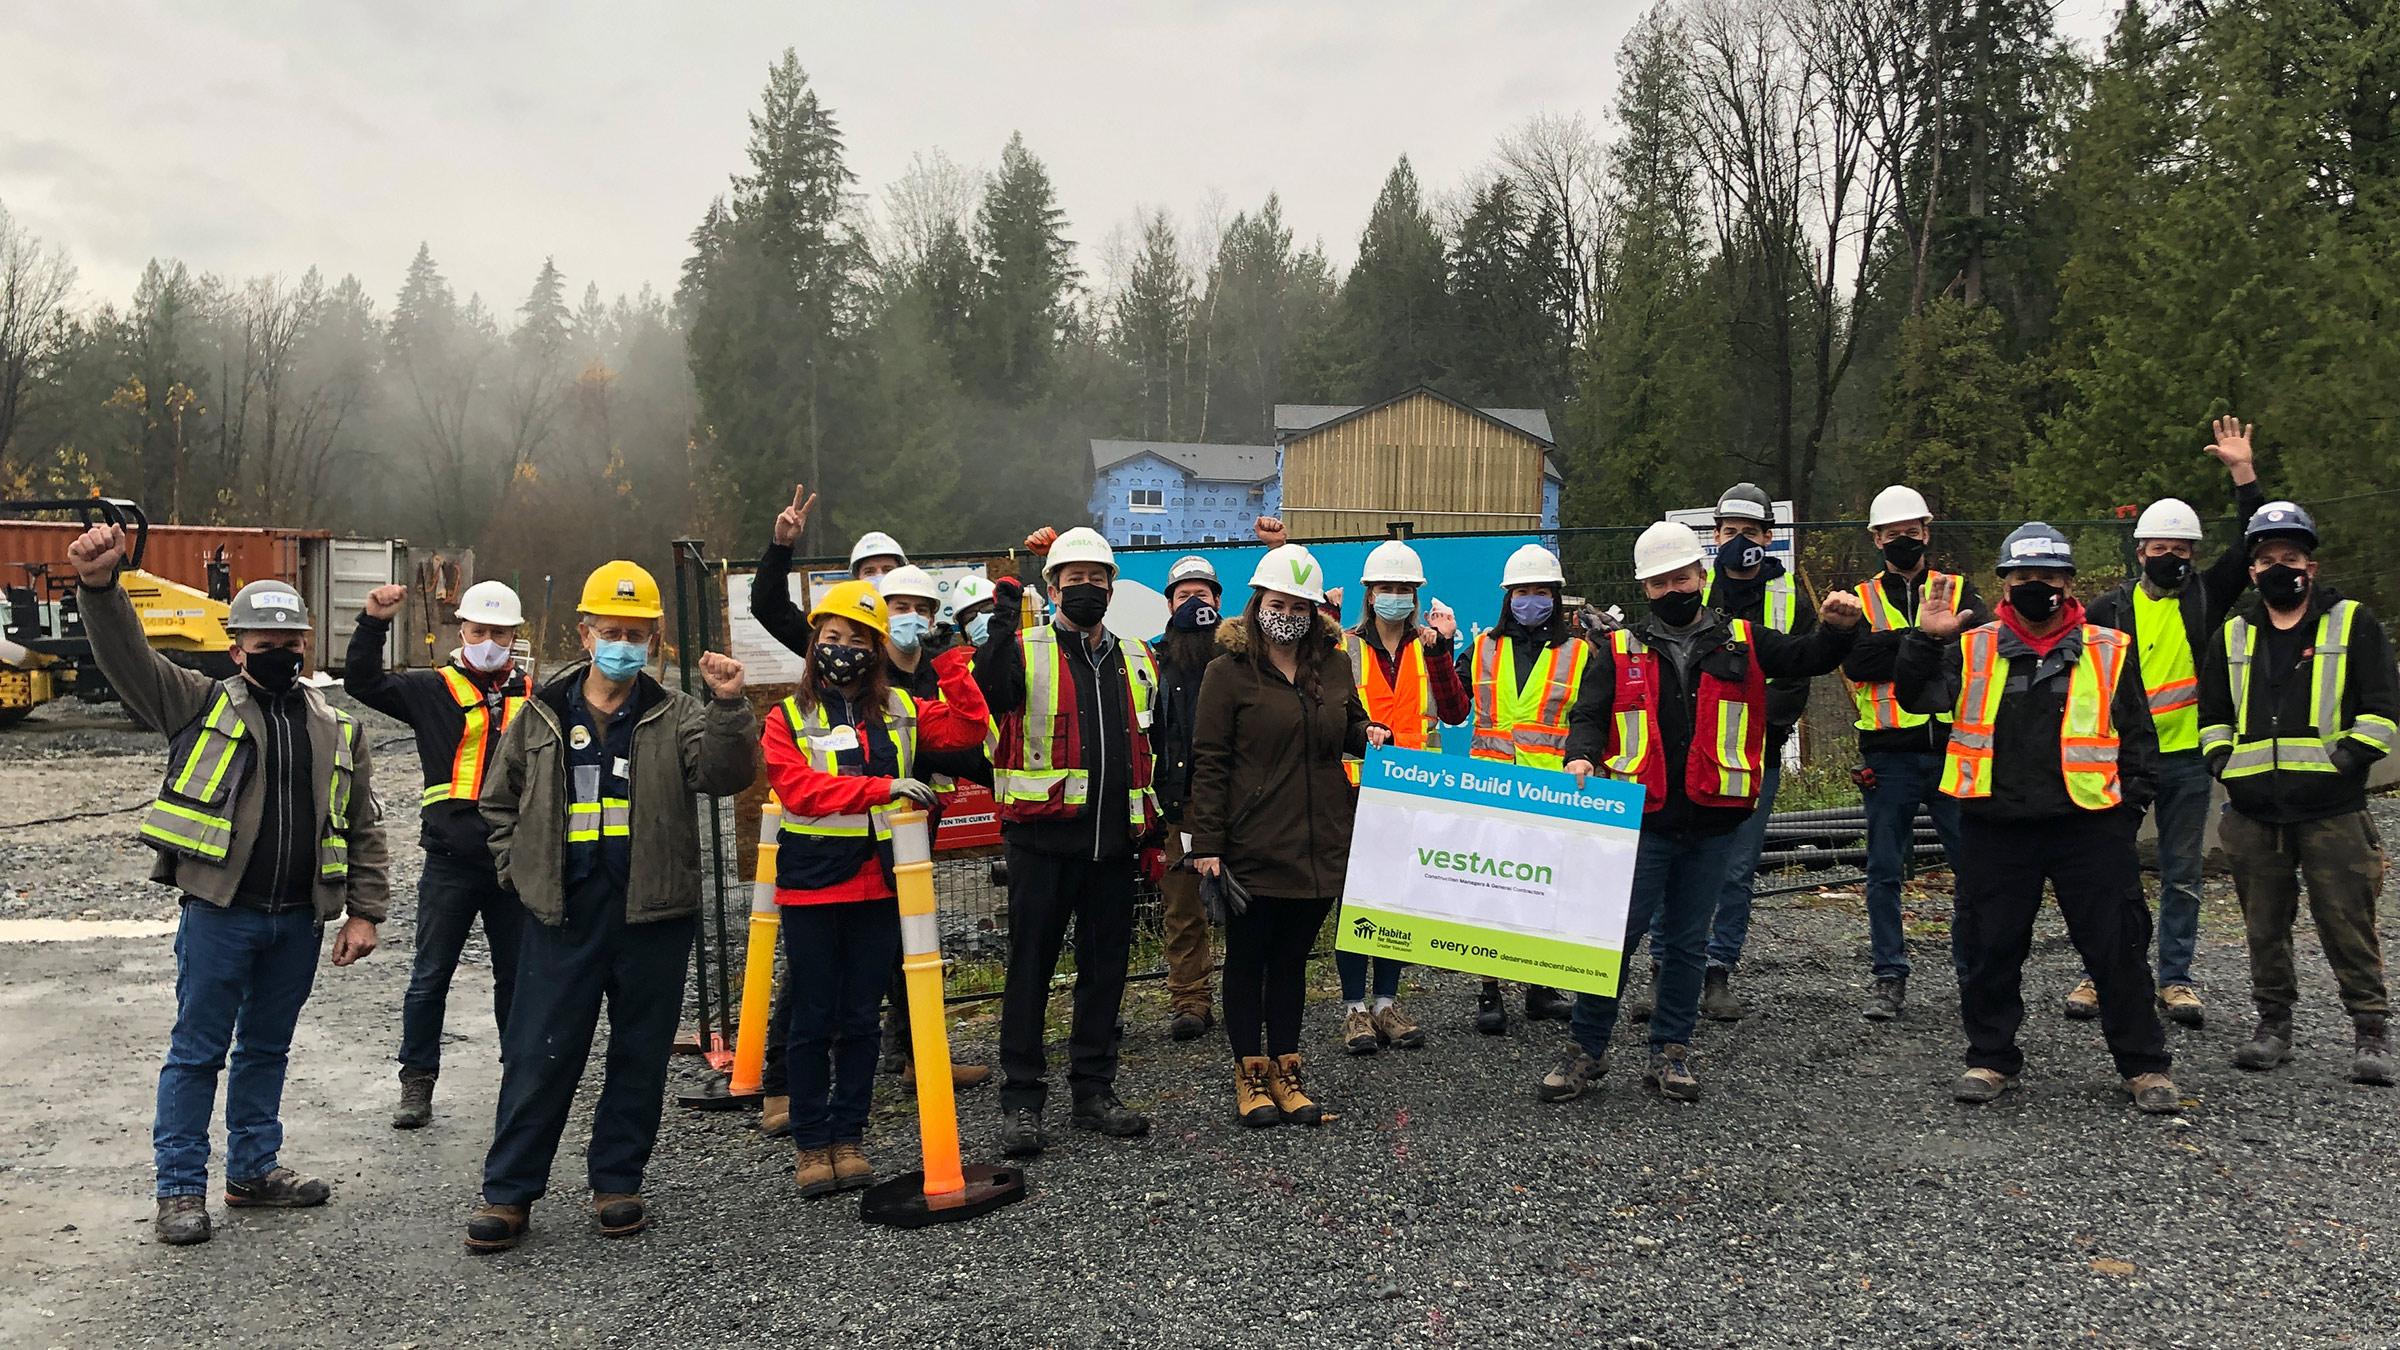 Habitat_Build_Day_Greater_Vancouver_2020_1.jpg